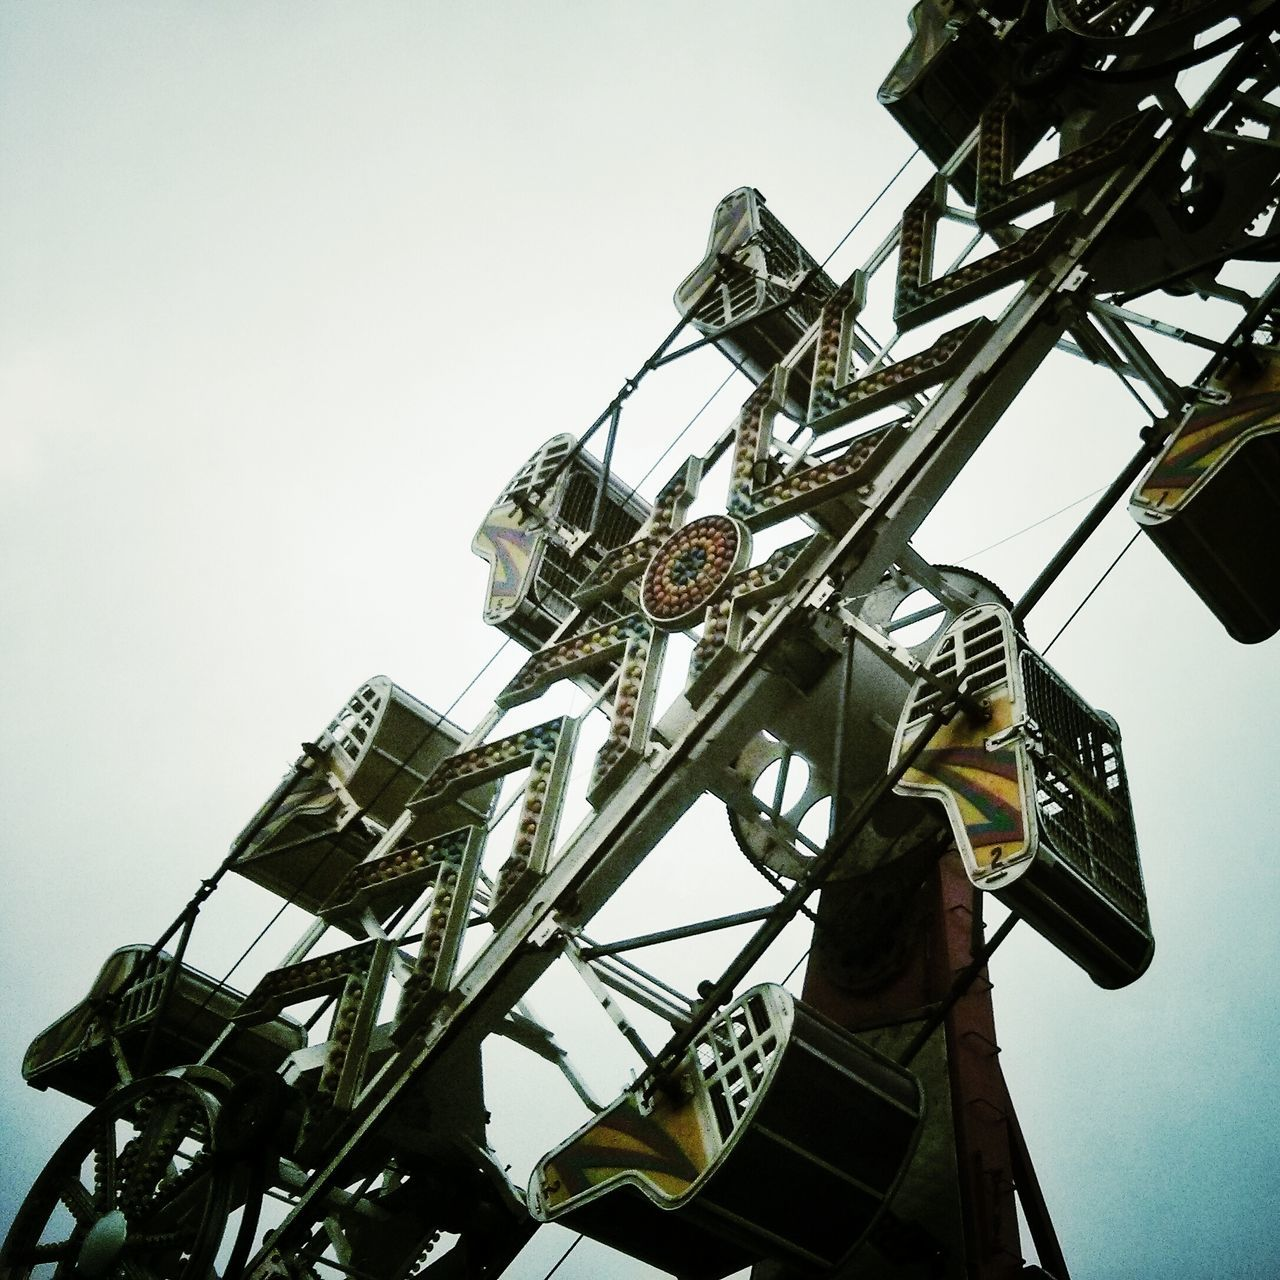 A rusty ride at the Woodstock Fair. Fair Rides Falling Apart